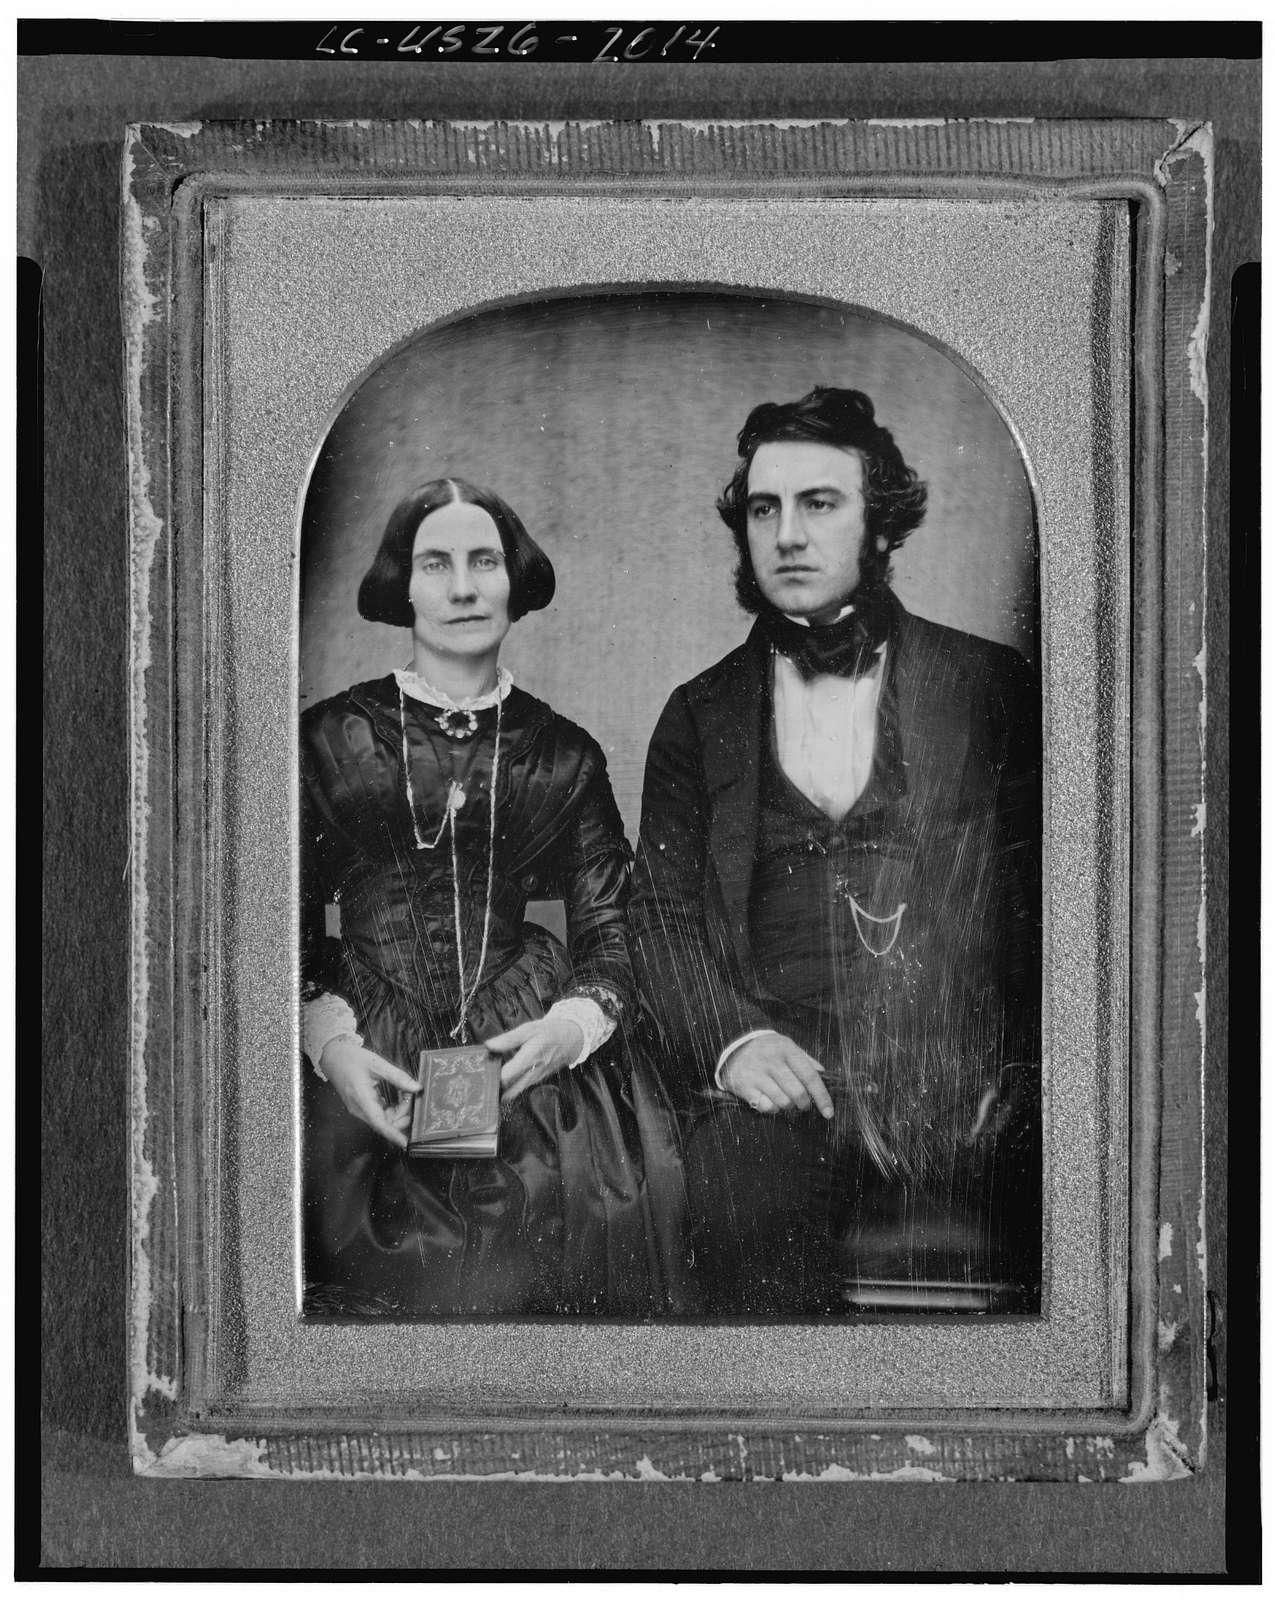 [David and Ellen Bell, three-quarter length portrait, seated]